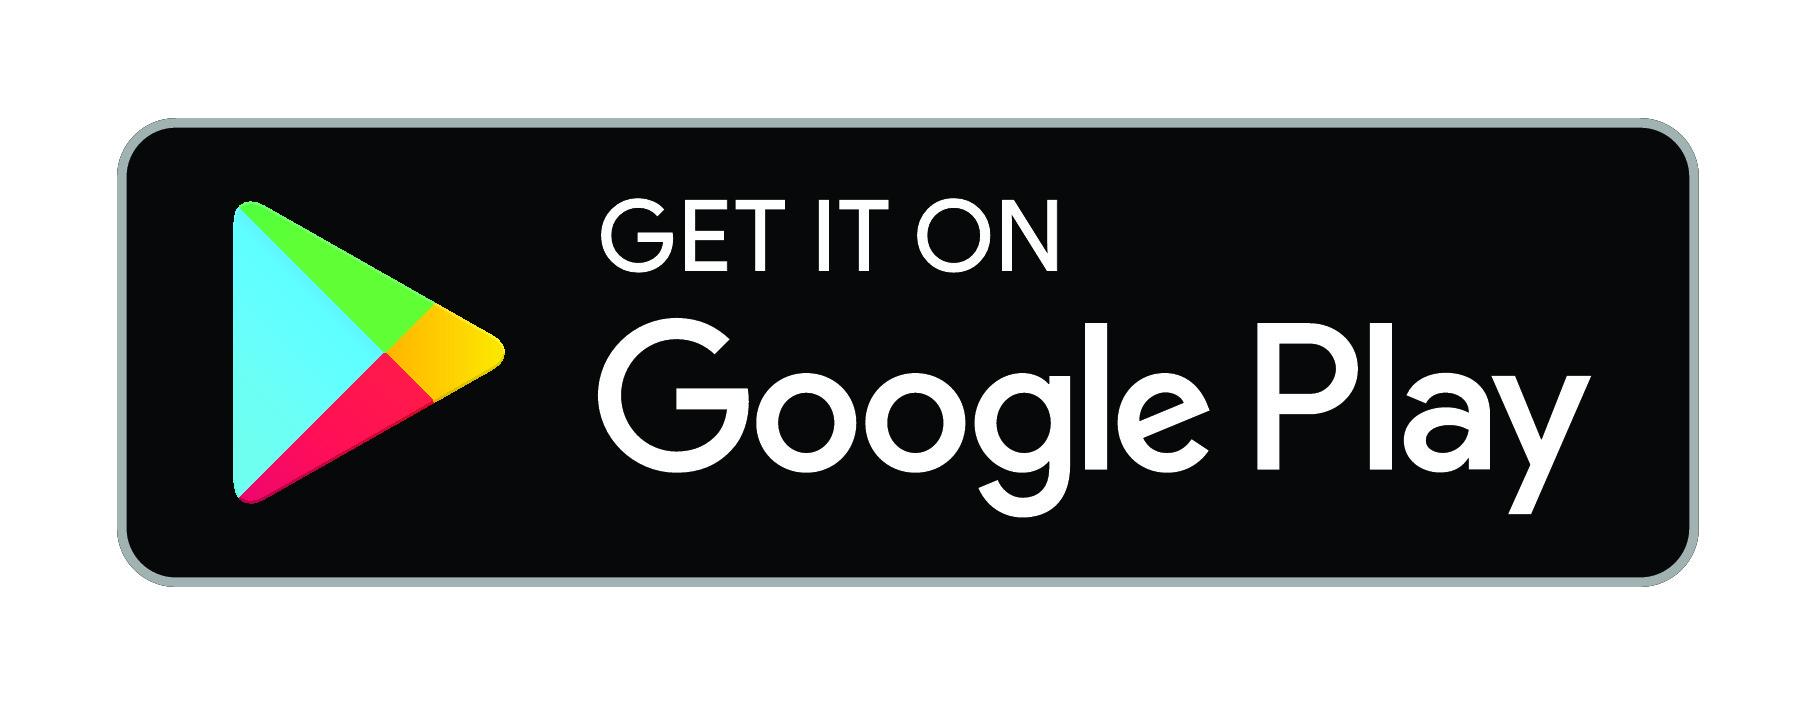 get-it-on-google-play-badge-seeklogo.com